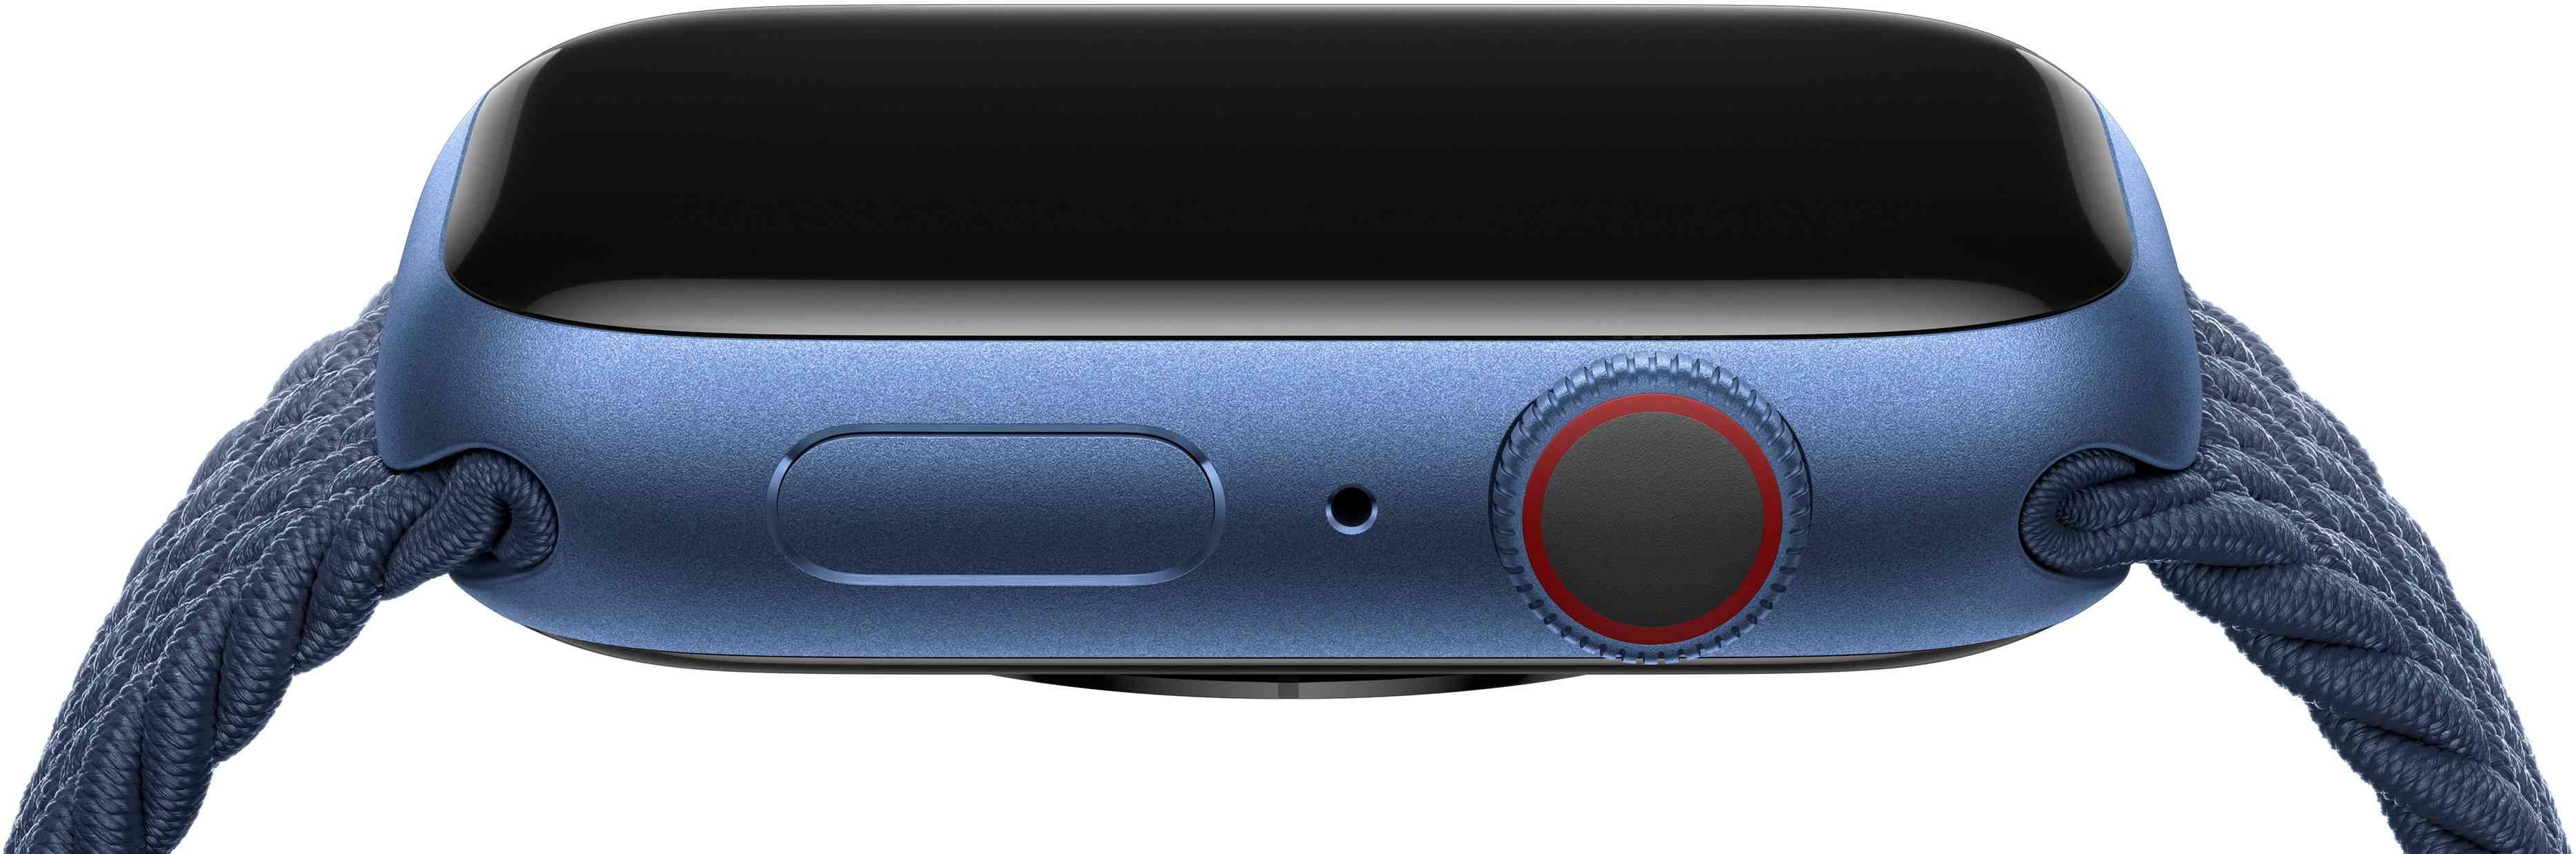 Apple Watch Series 7 side view in blue